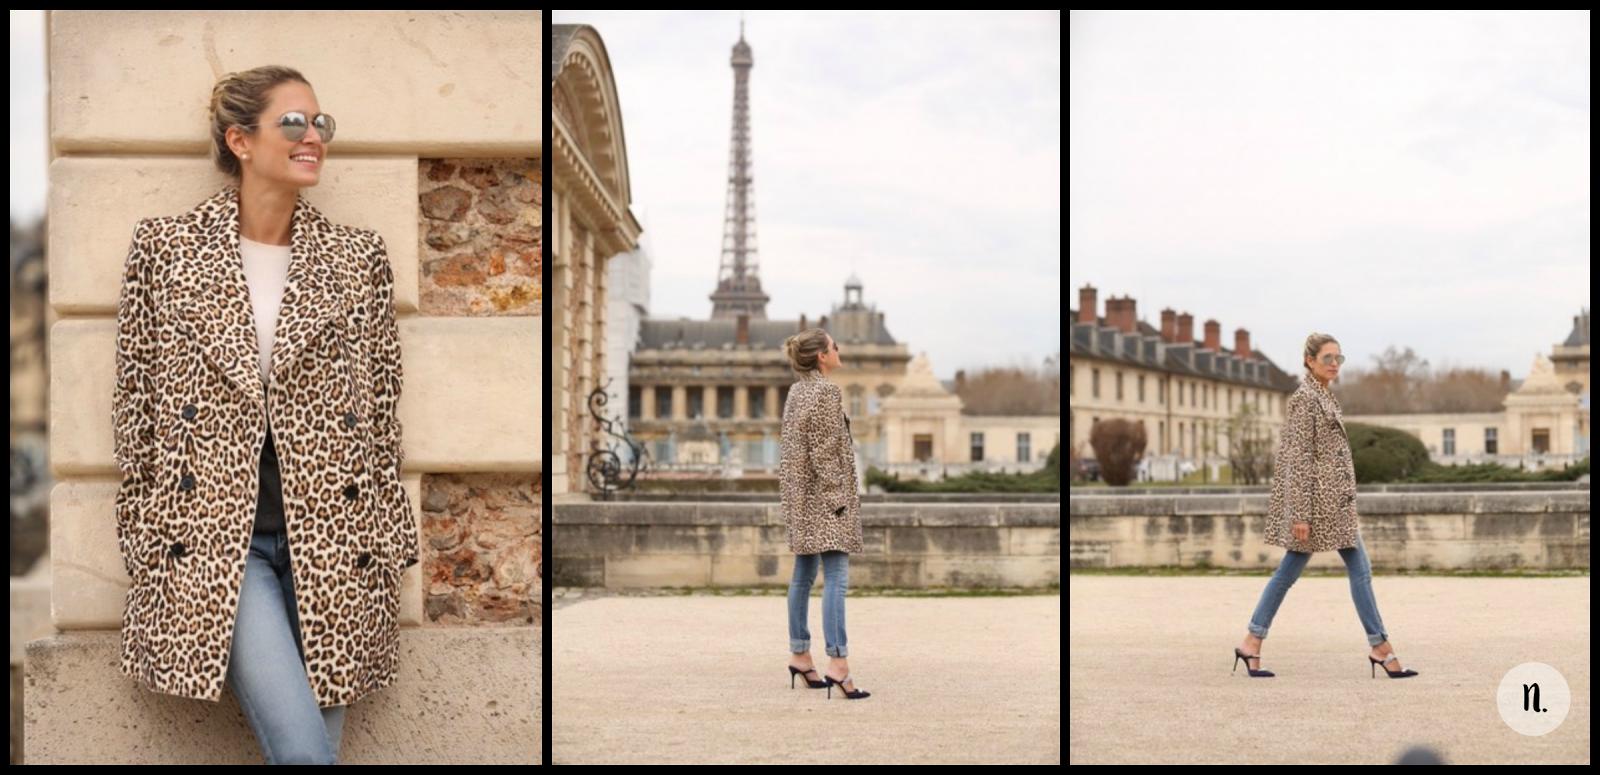 Helena Bordon Heleninha Bordon Moda Semana de moda Semana de moda de Paris PFW 2017  Paris Fashion Week  Paris Fashion Week 17/18